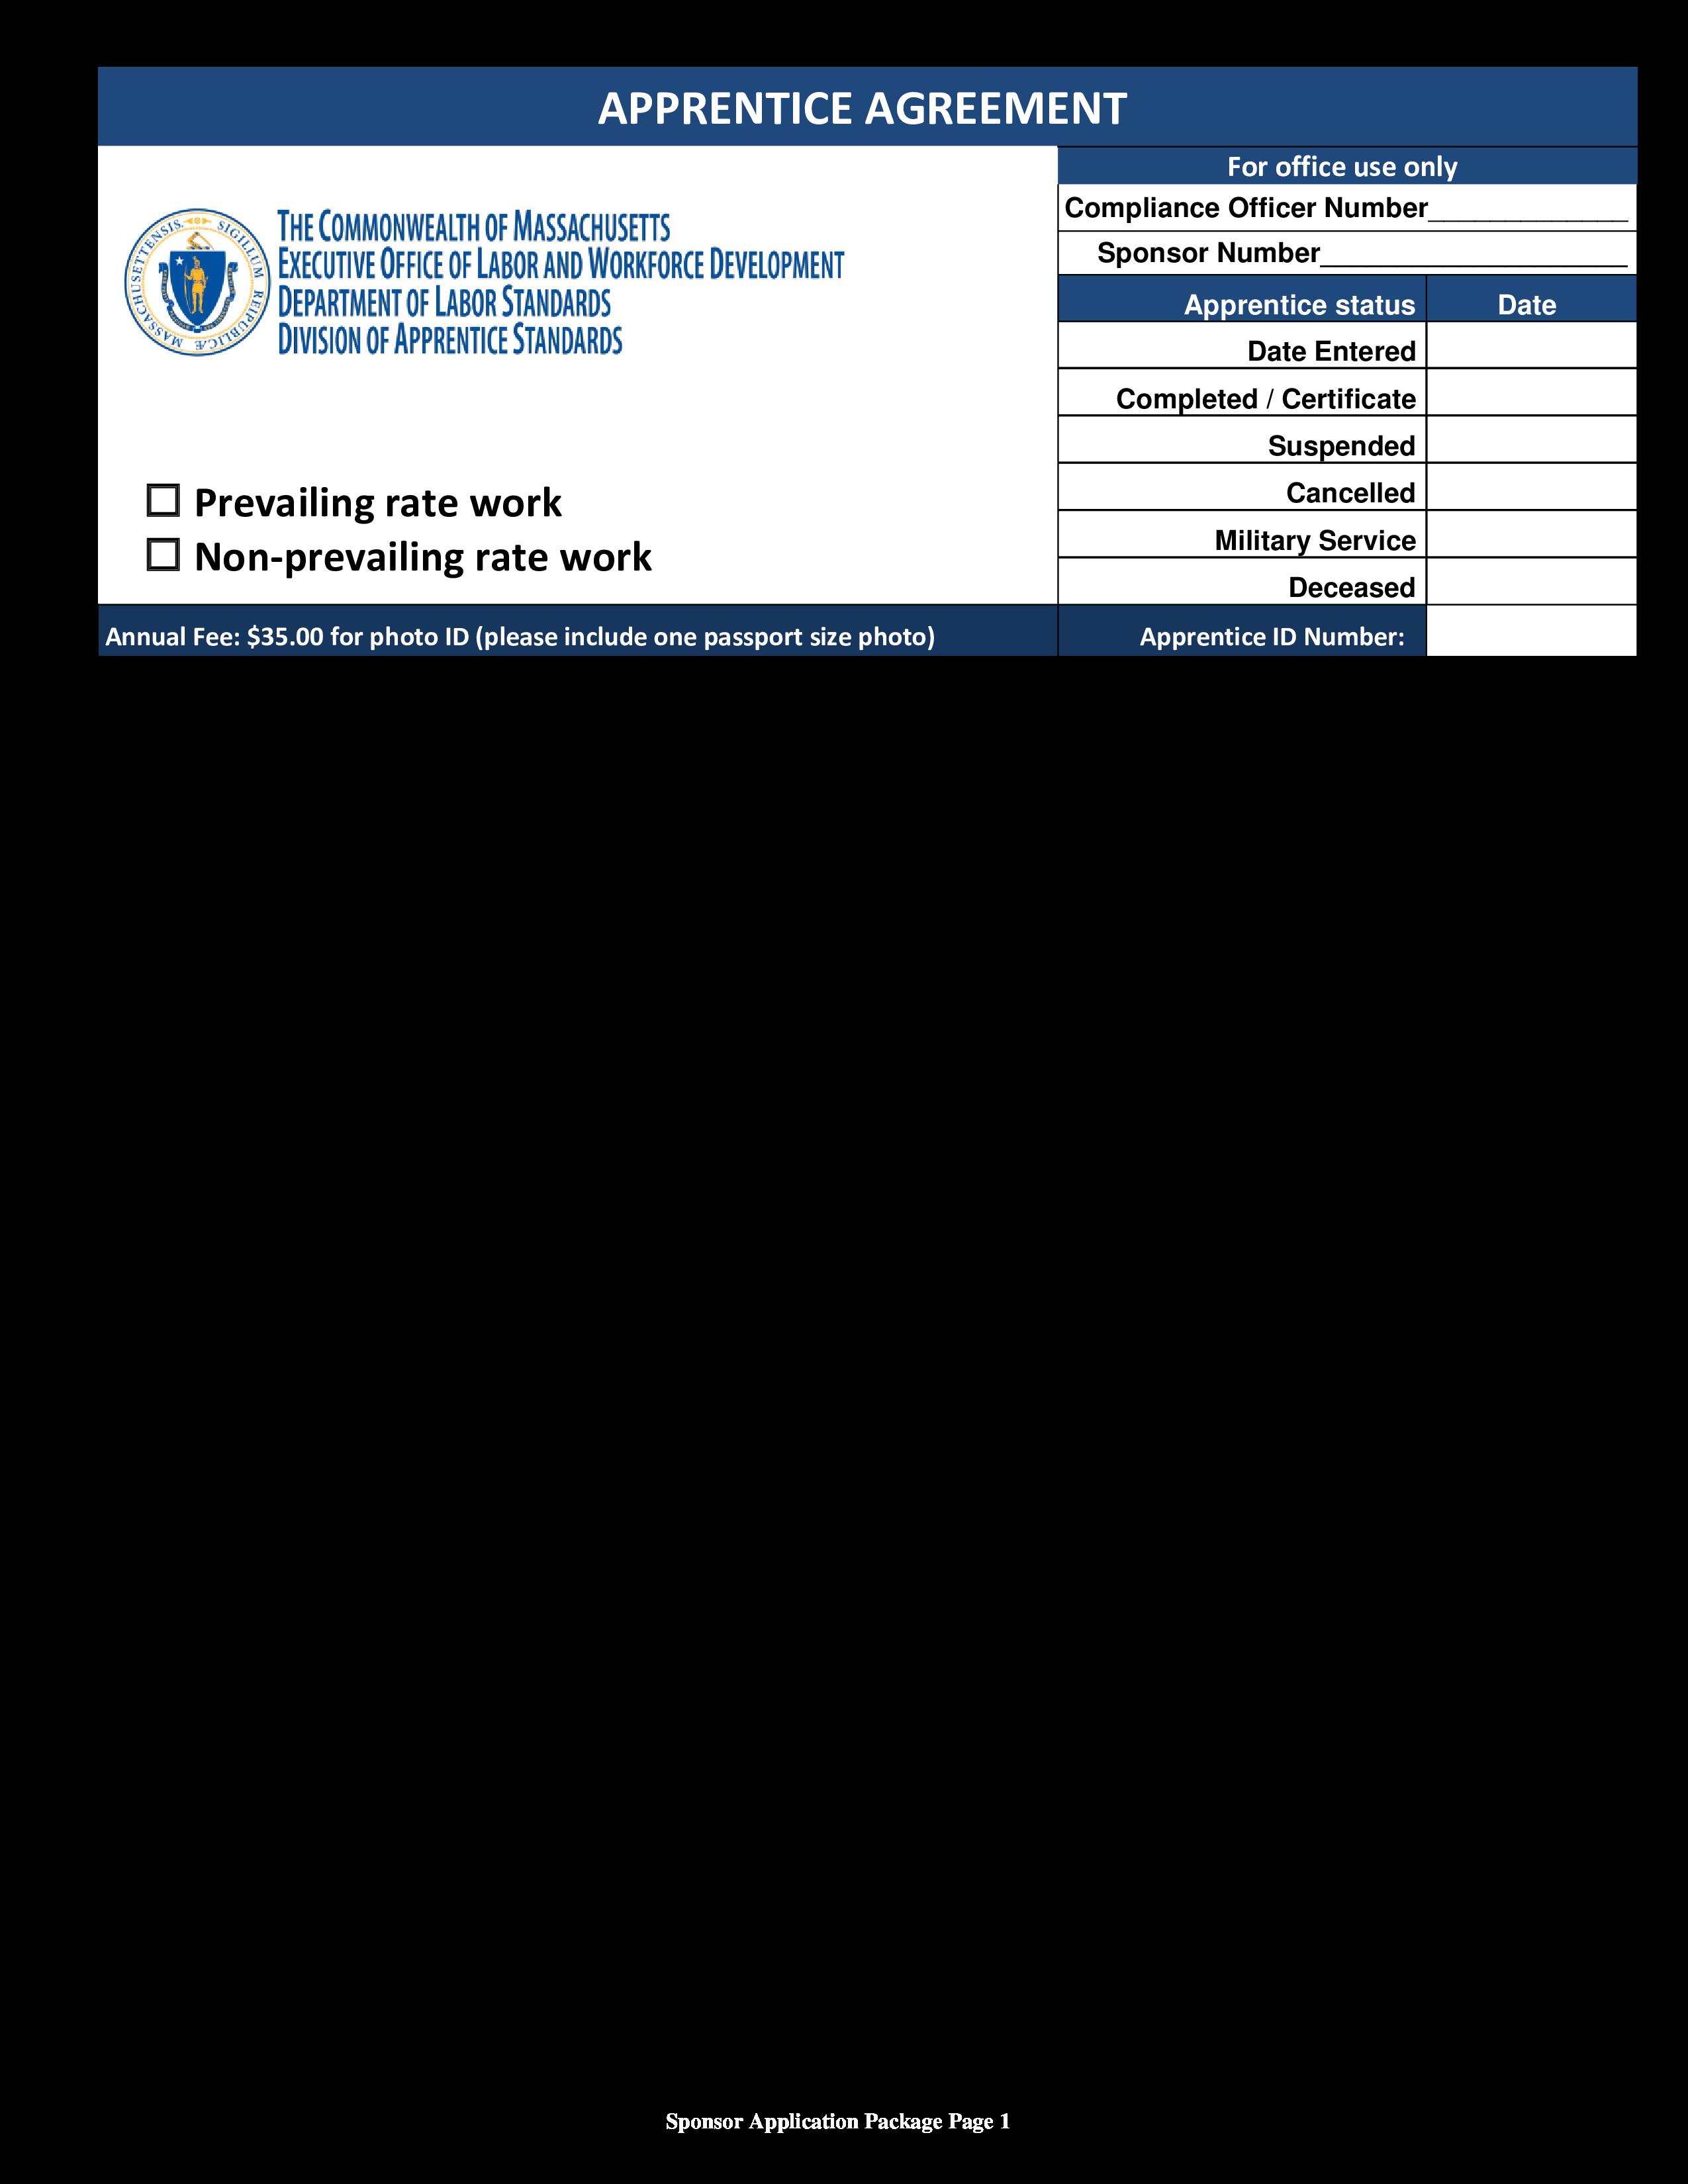 Training Apprenticeship Agreement Form Templates At